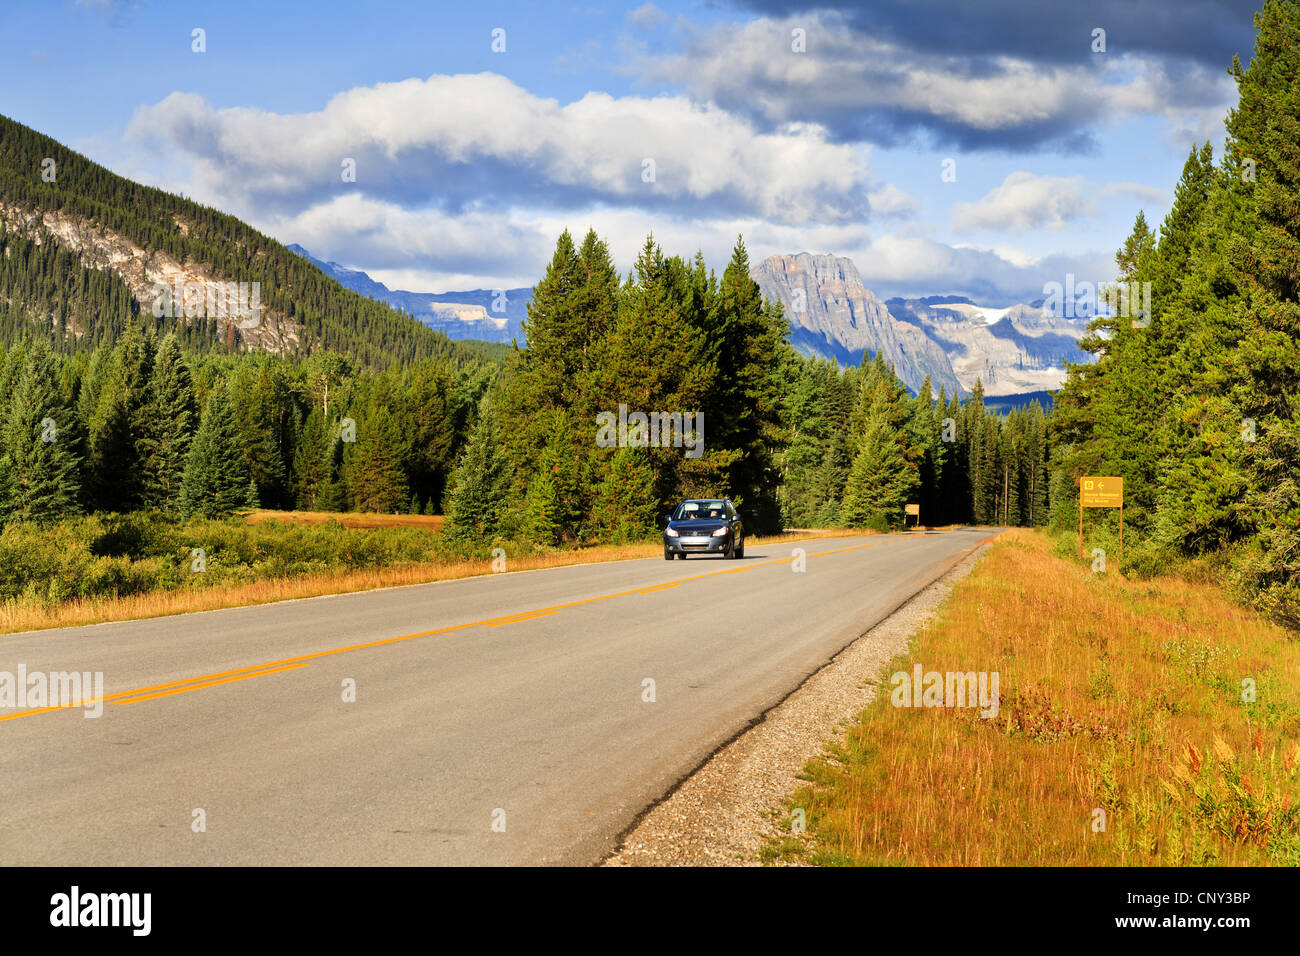 passenger car on a road through the National Park, Canada, Alberta, Banff National Park - Stock Image